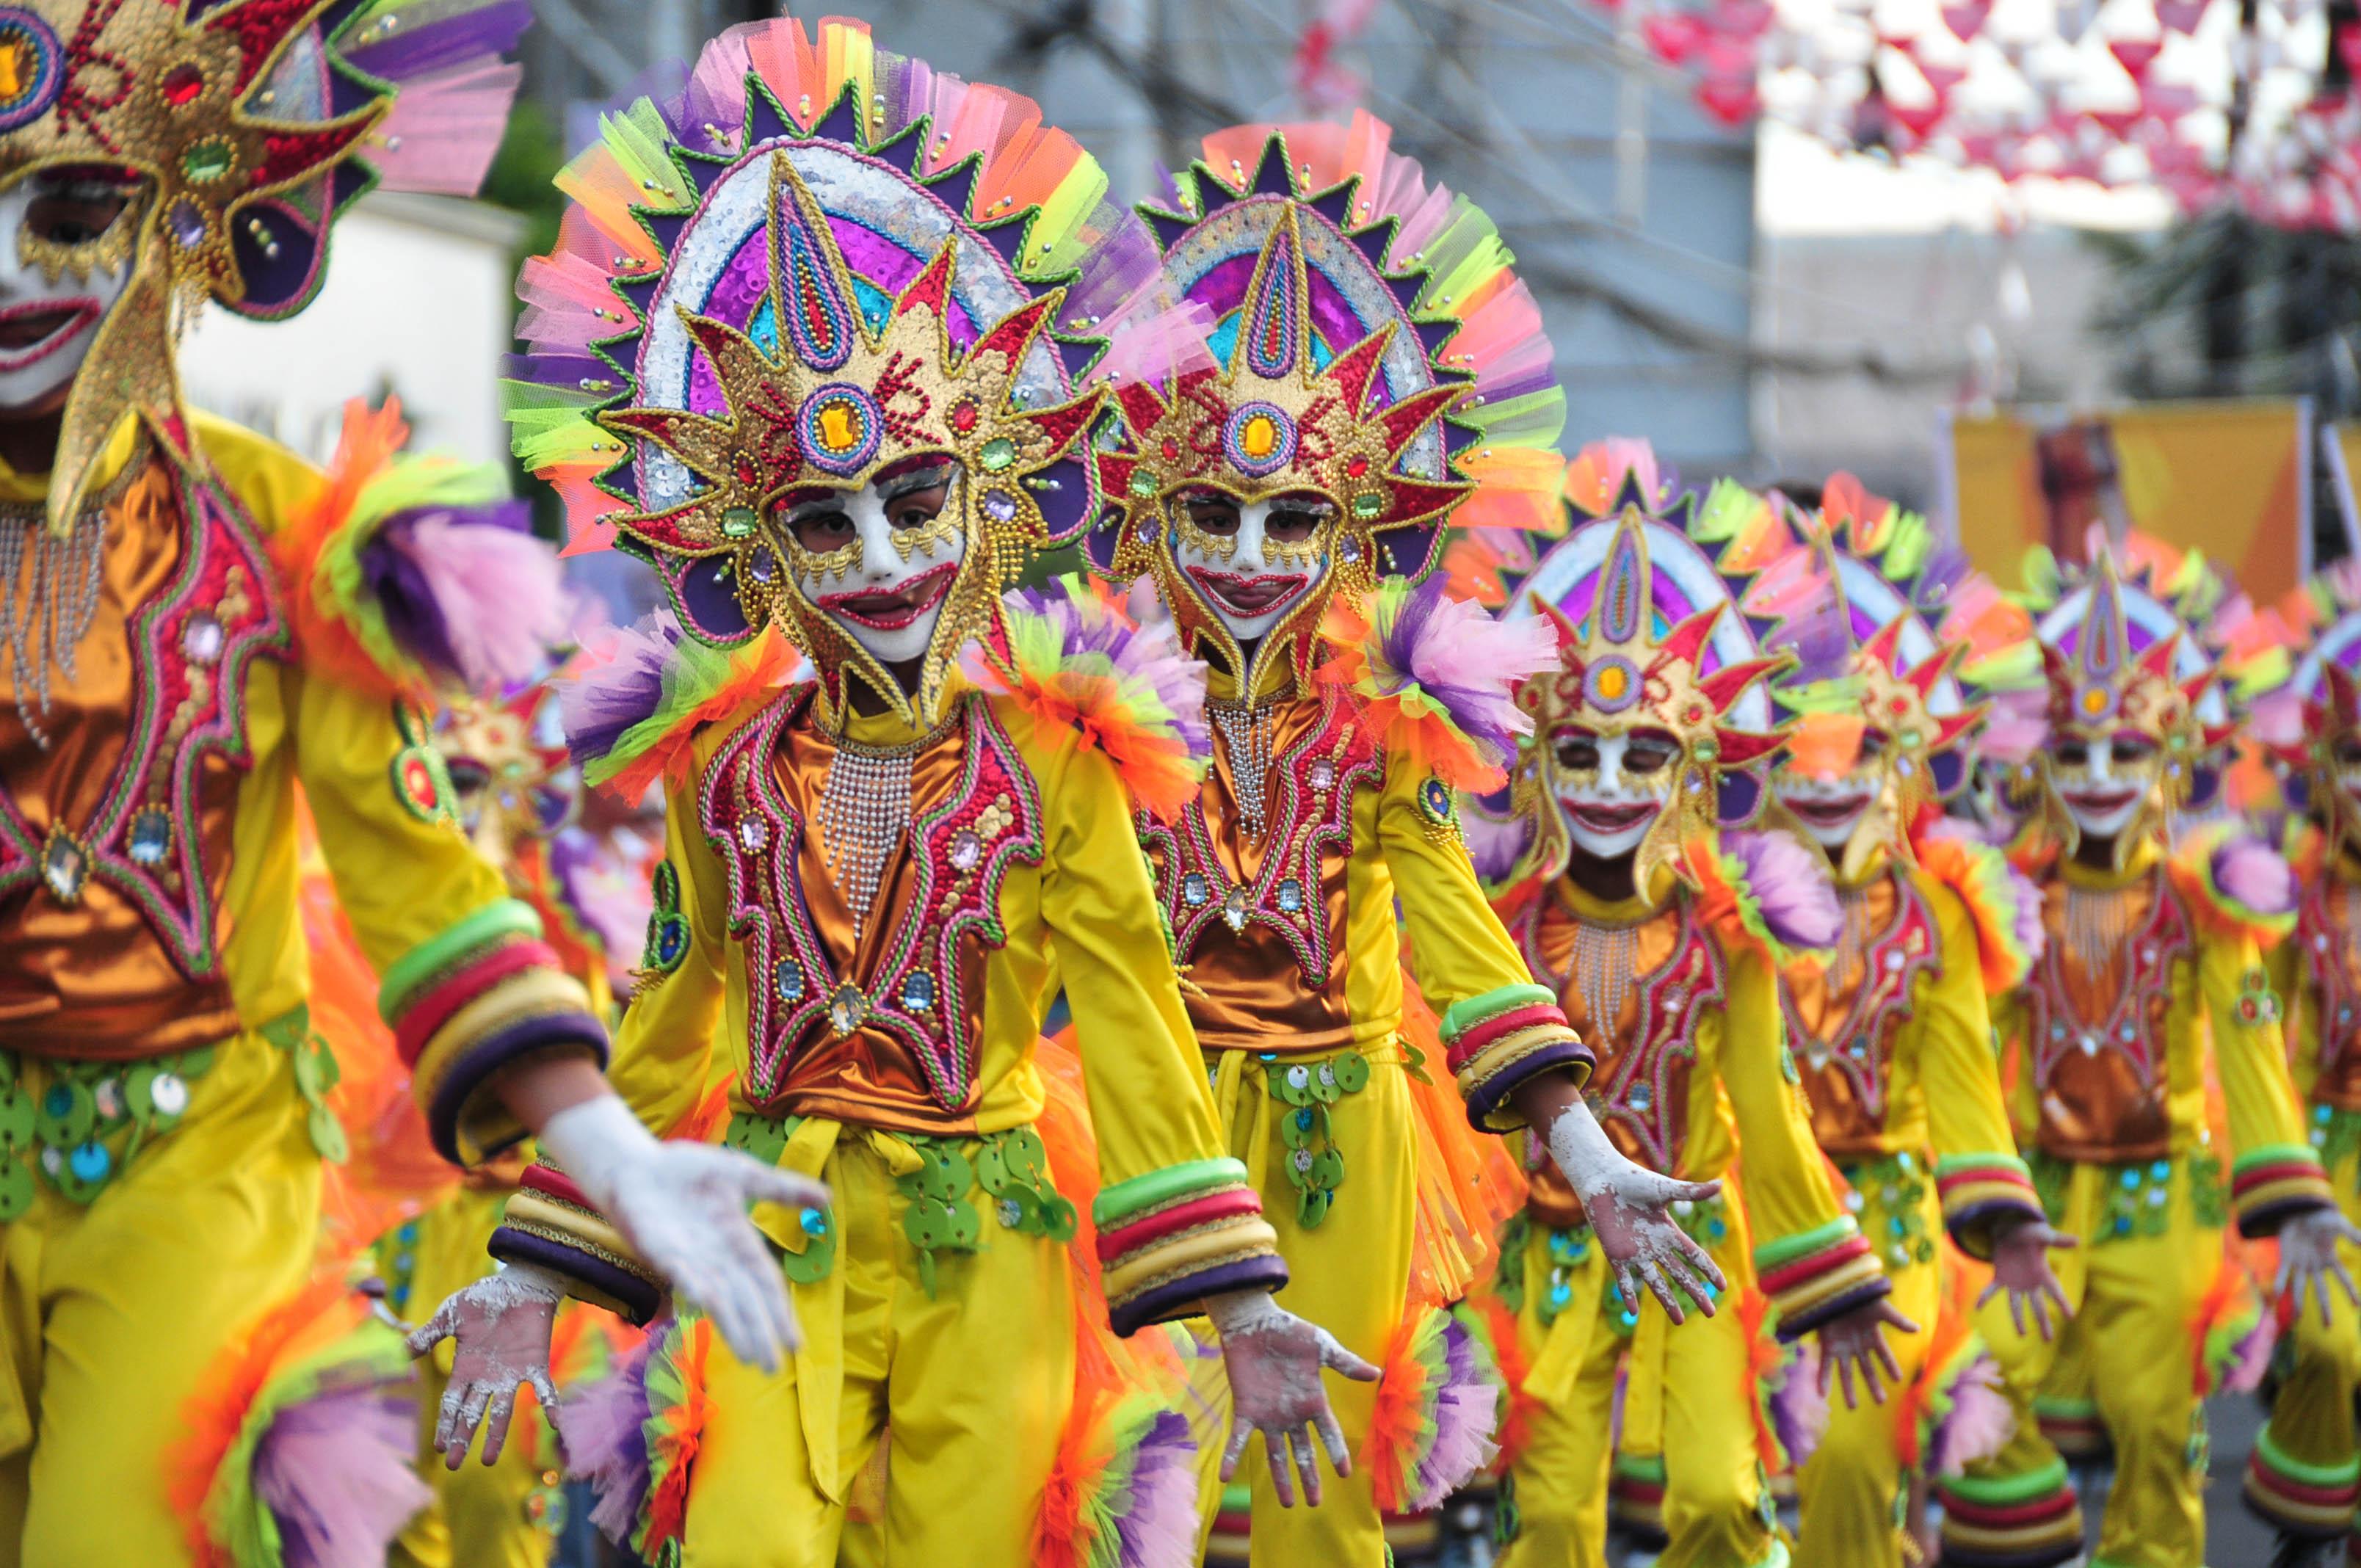 Festival clipart maskara Kinnmarccamus festival masskara